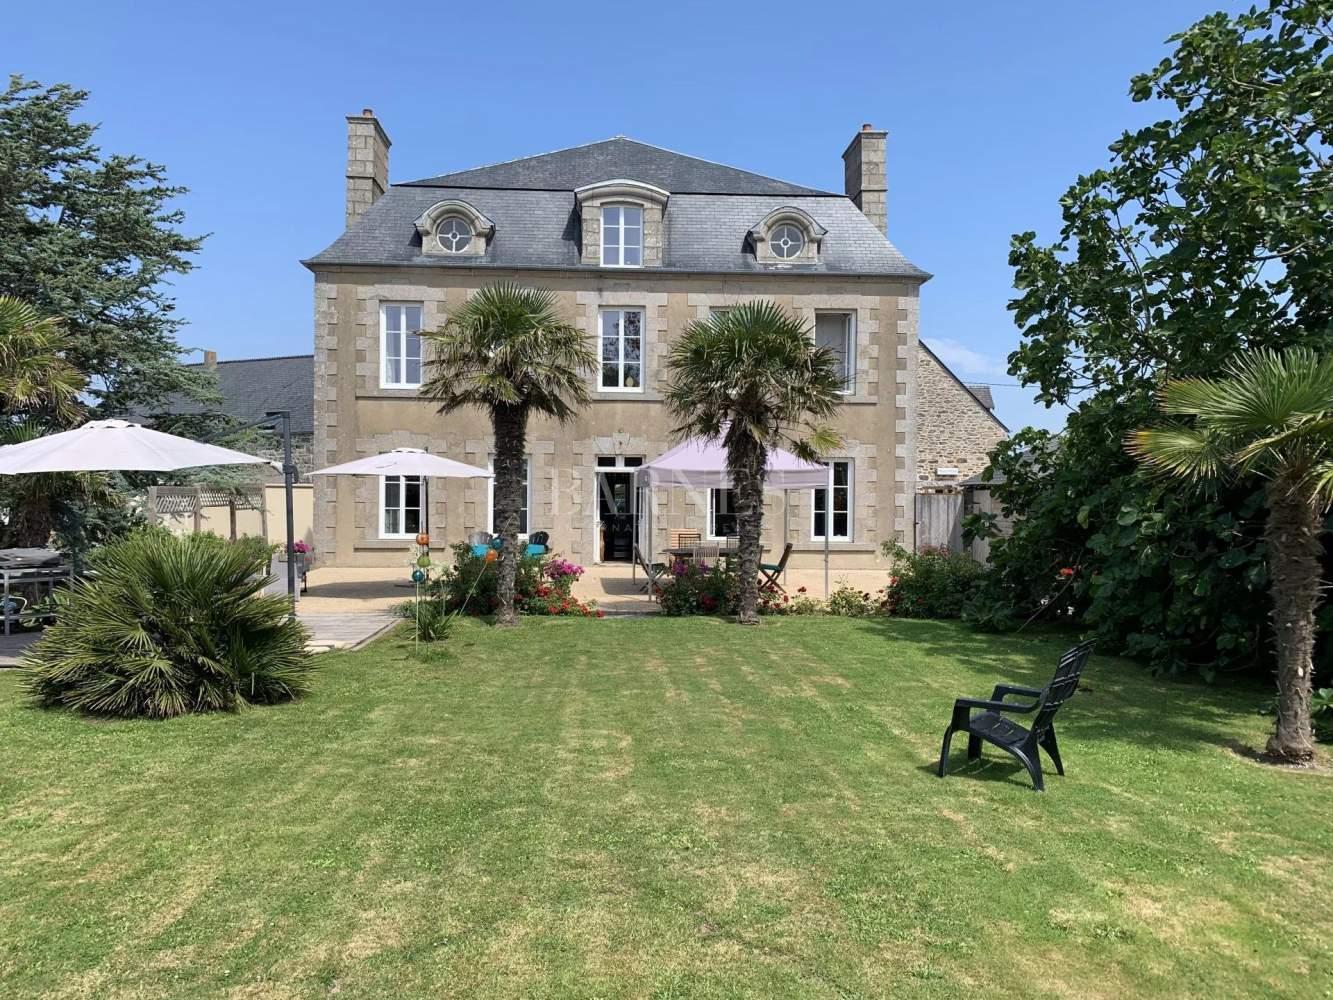 Cherbourg-en-Cotentin  - Property  - picture 1